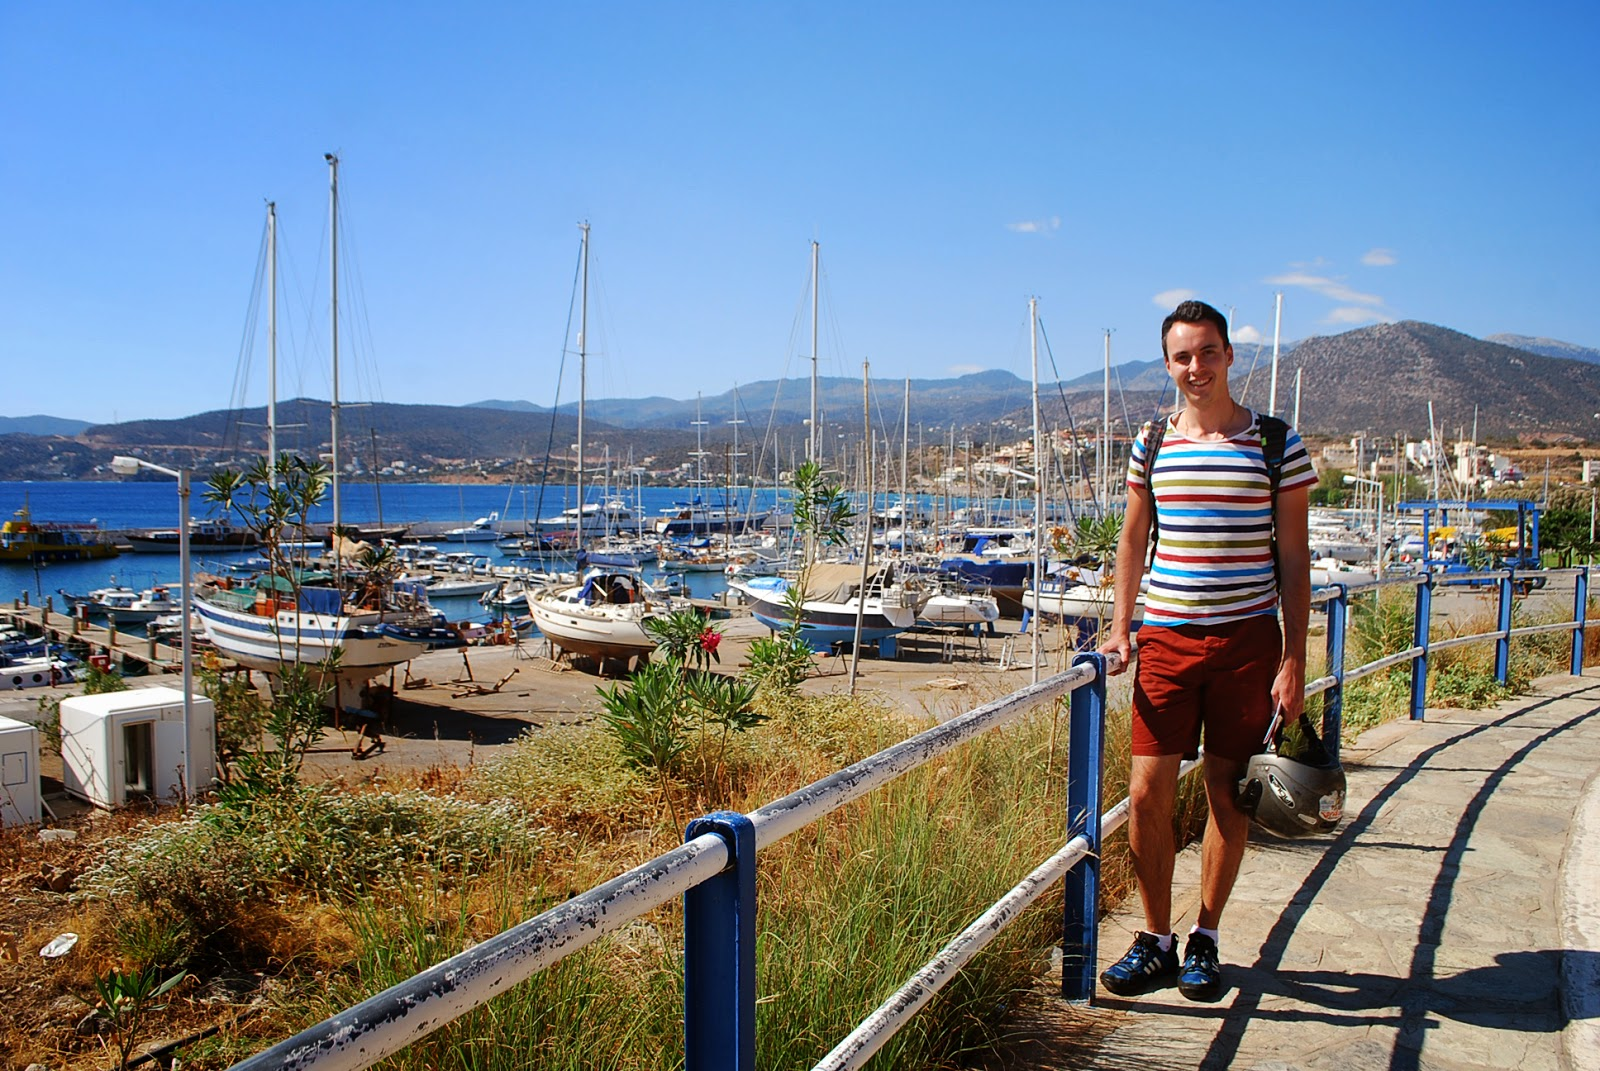 Порт, Агиос Николаос, Крит. Port, Agios Nikolaos, Crete.